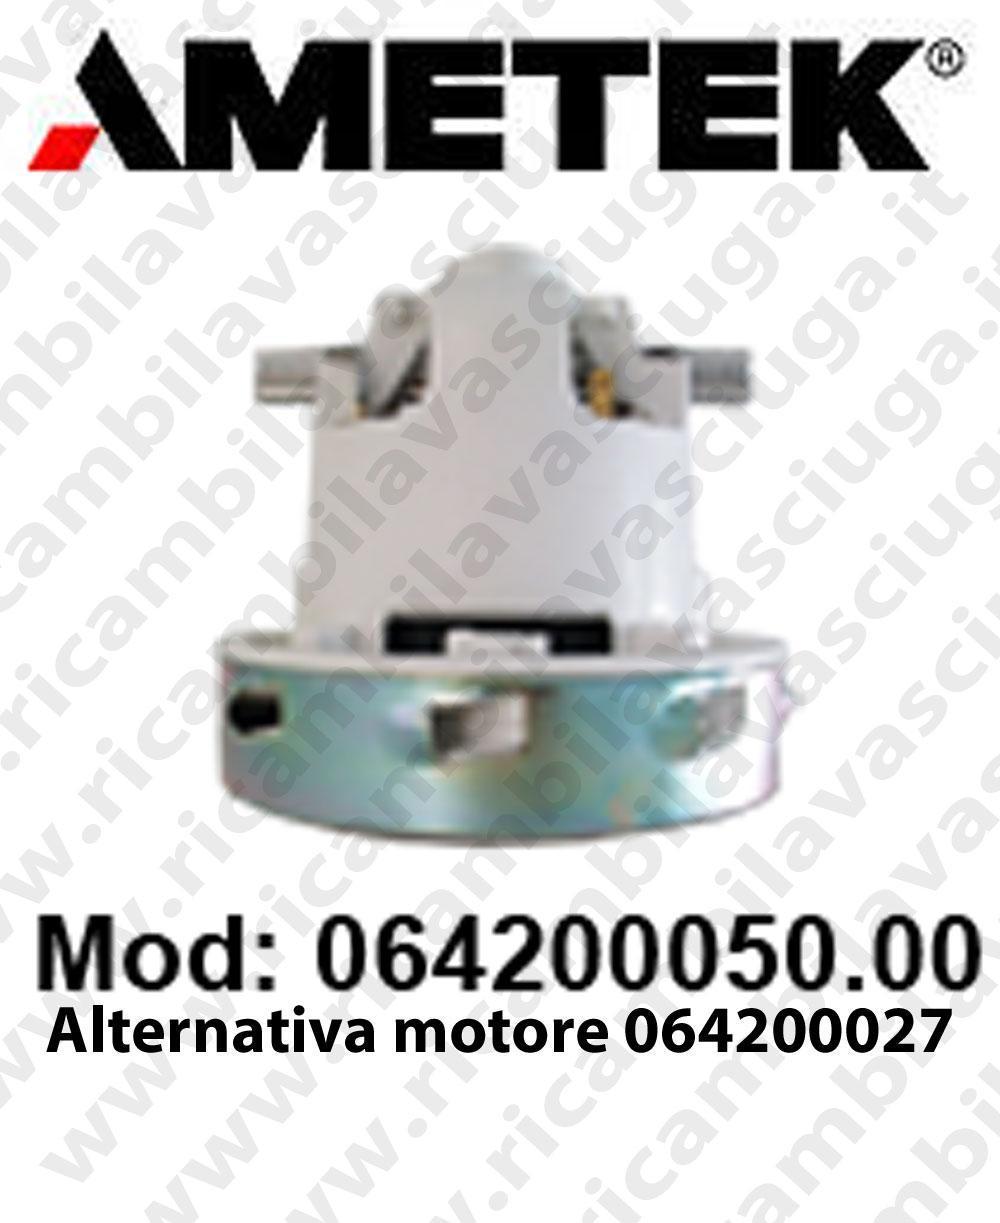 Vacuum motor 064200050.00 AMETEK for scrubber dryer and vacuum cleaner ottima alternativa al motore 064200027